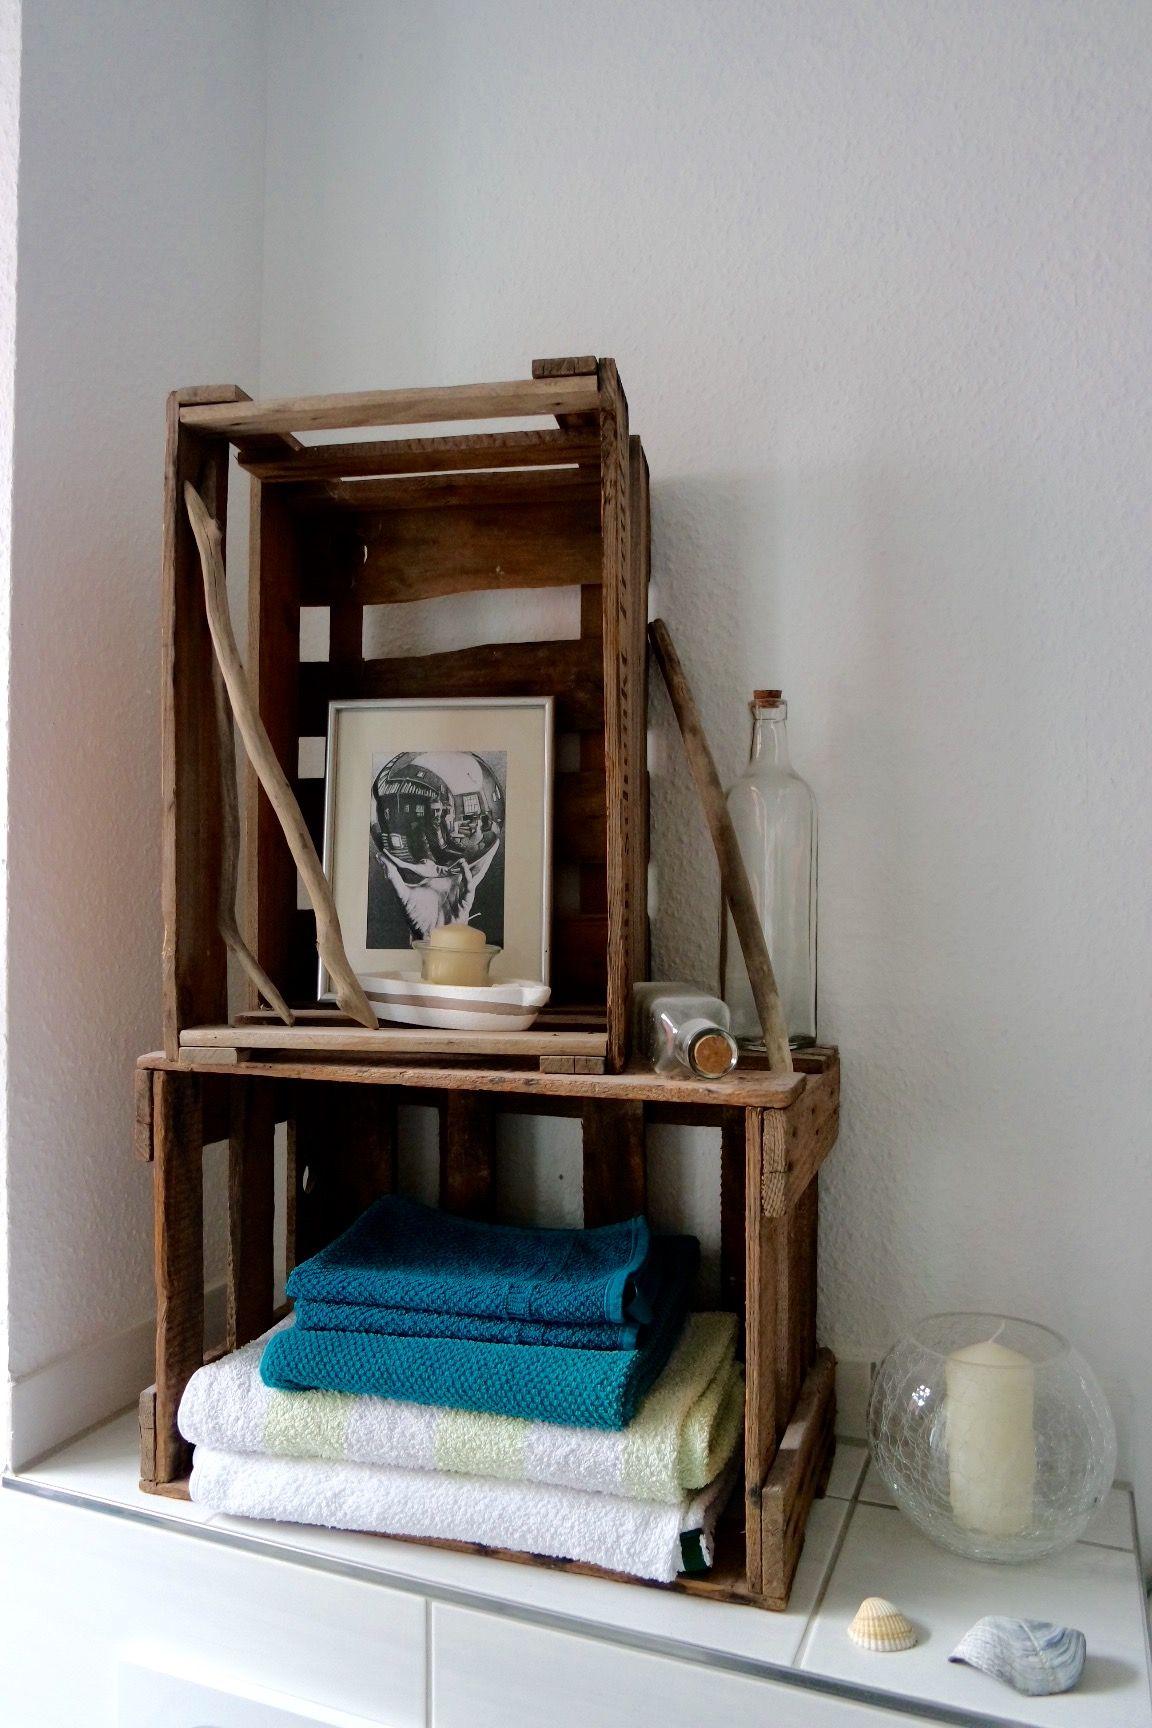 badezimmer deko  design, Interieur, Retro, Roomtour   Mbel